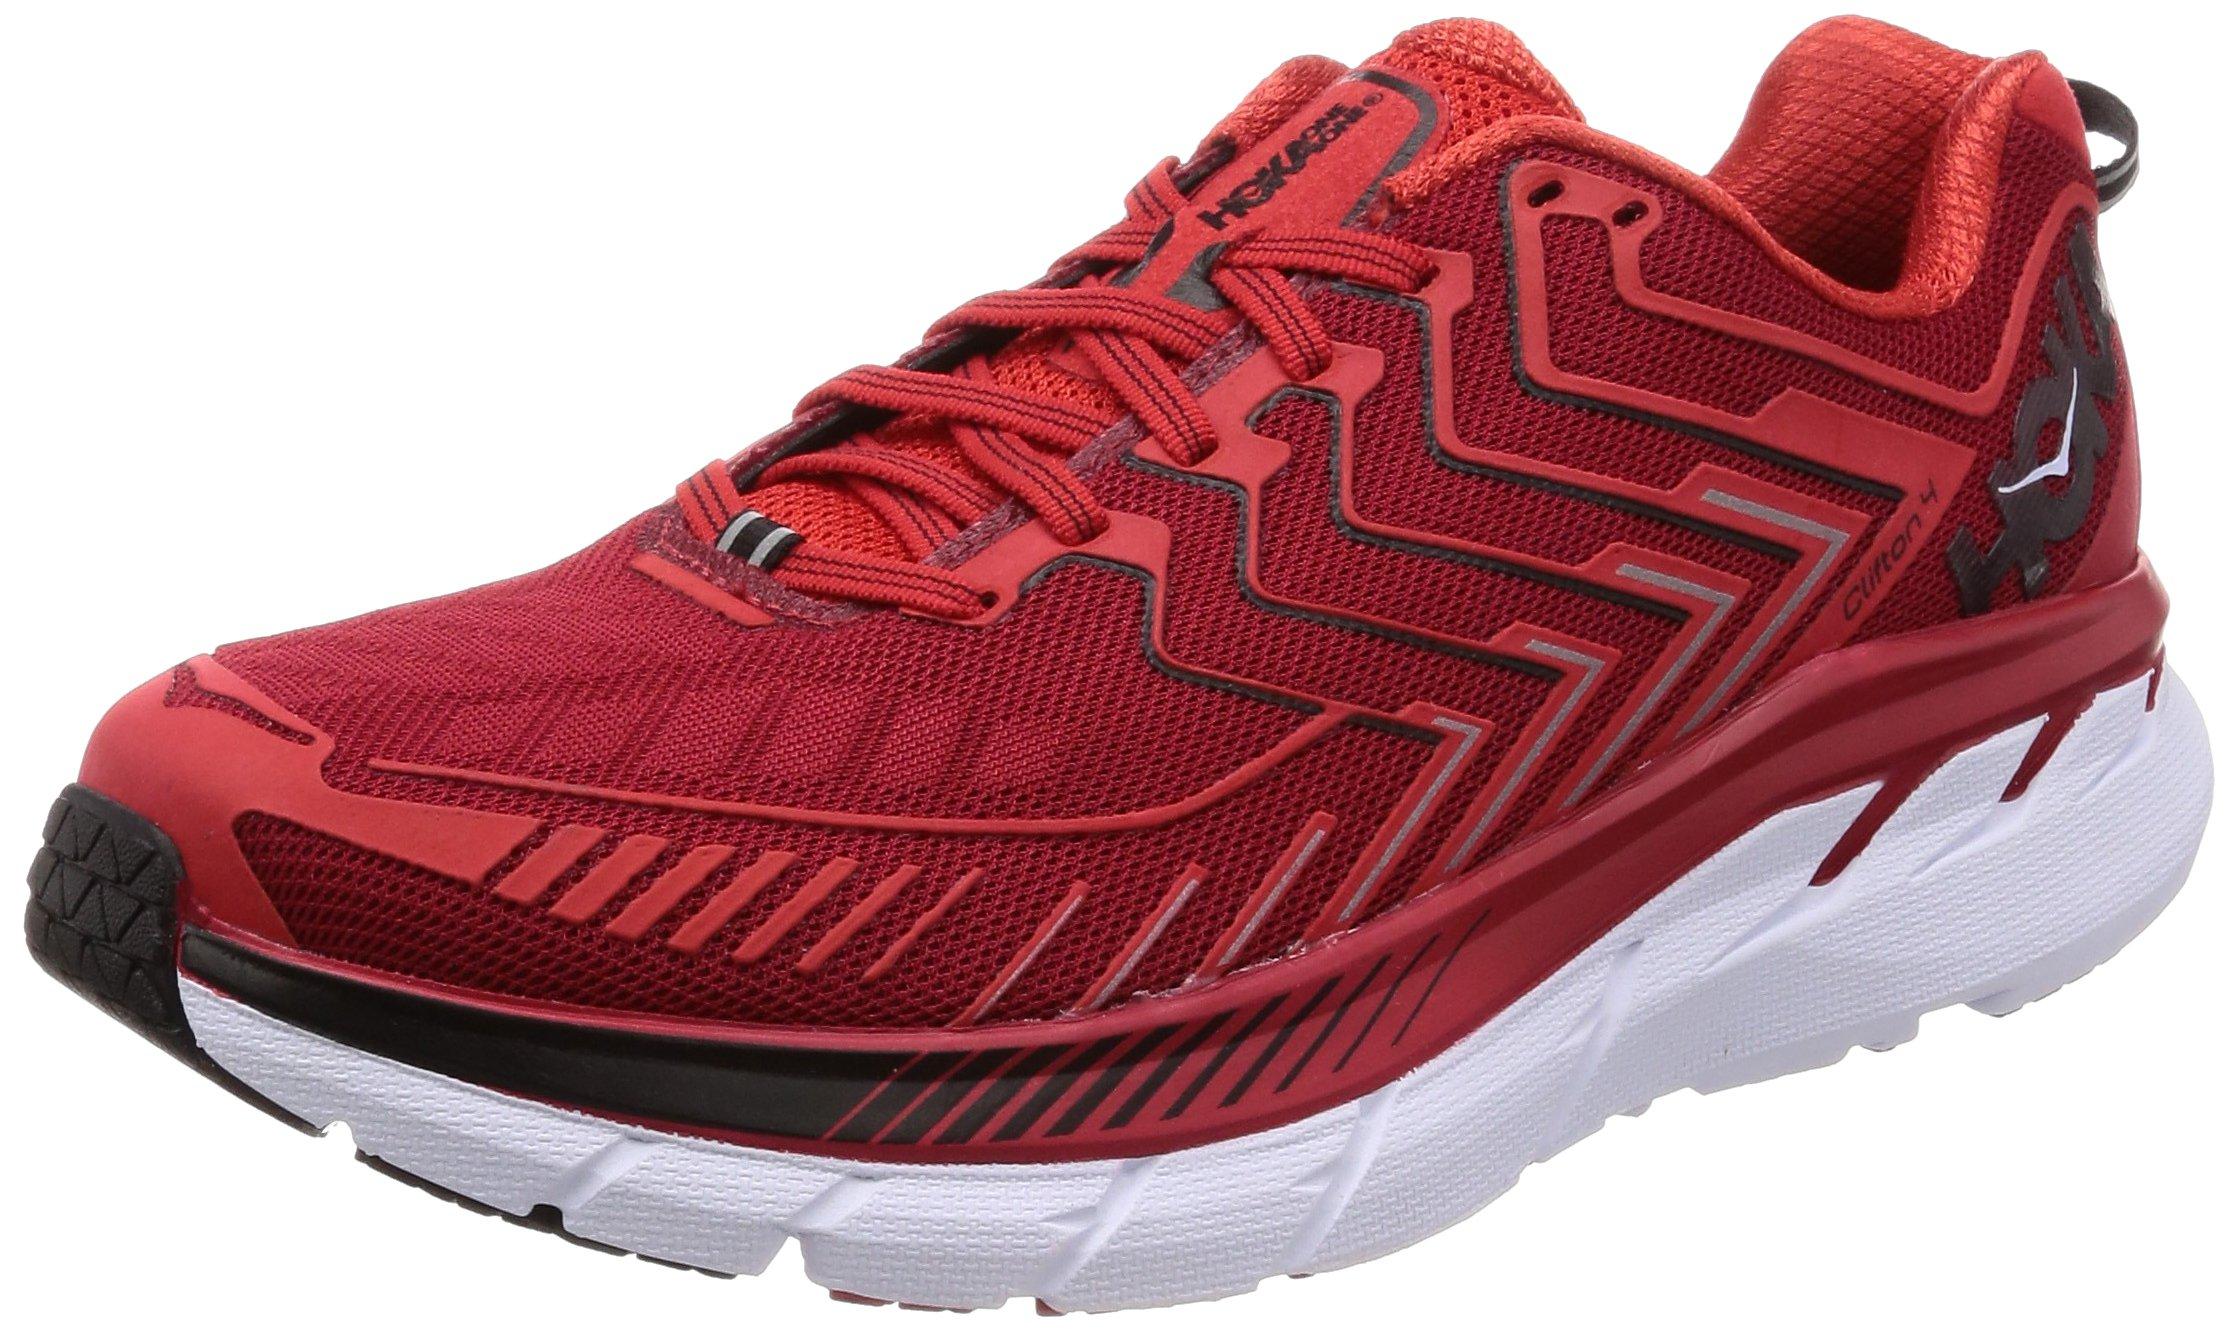 Clifton 4 Running Shoe Haute Red